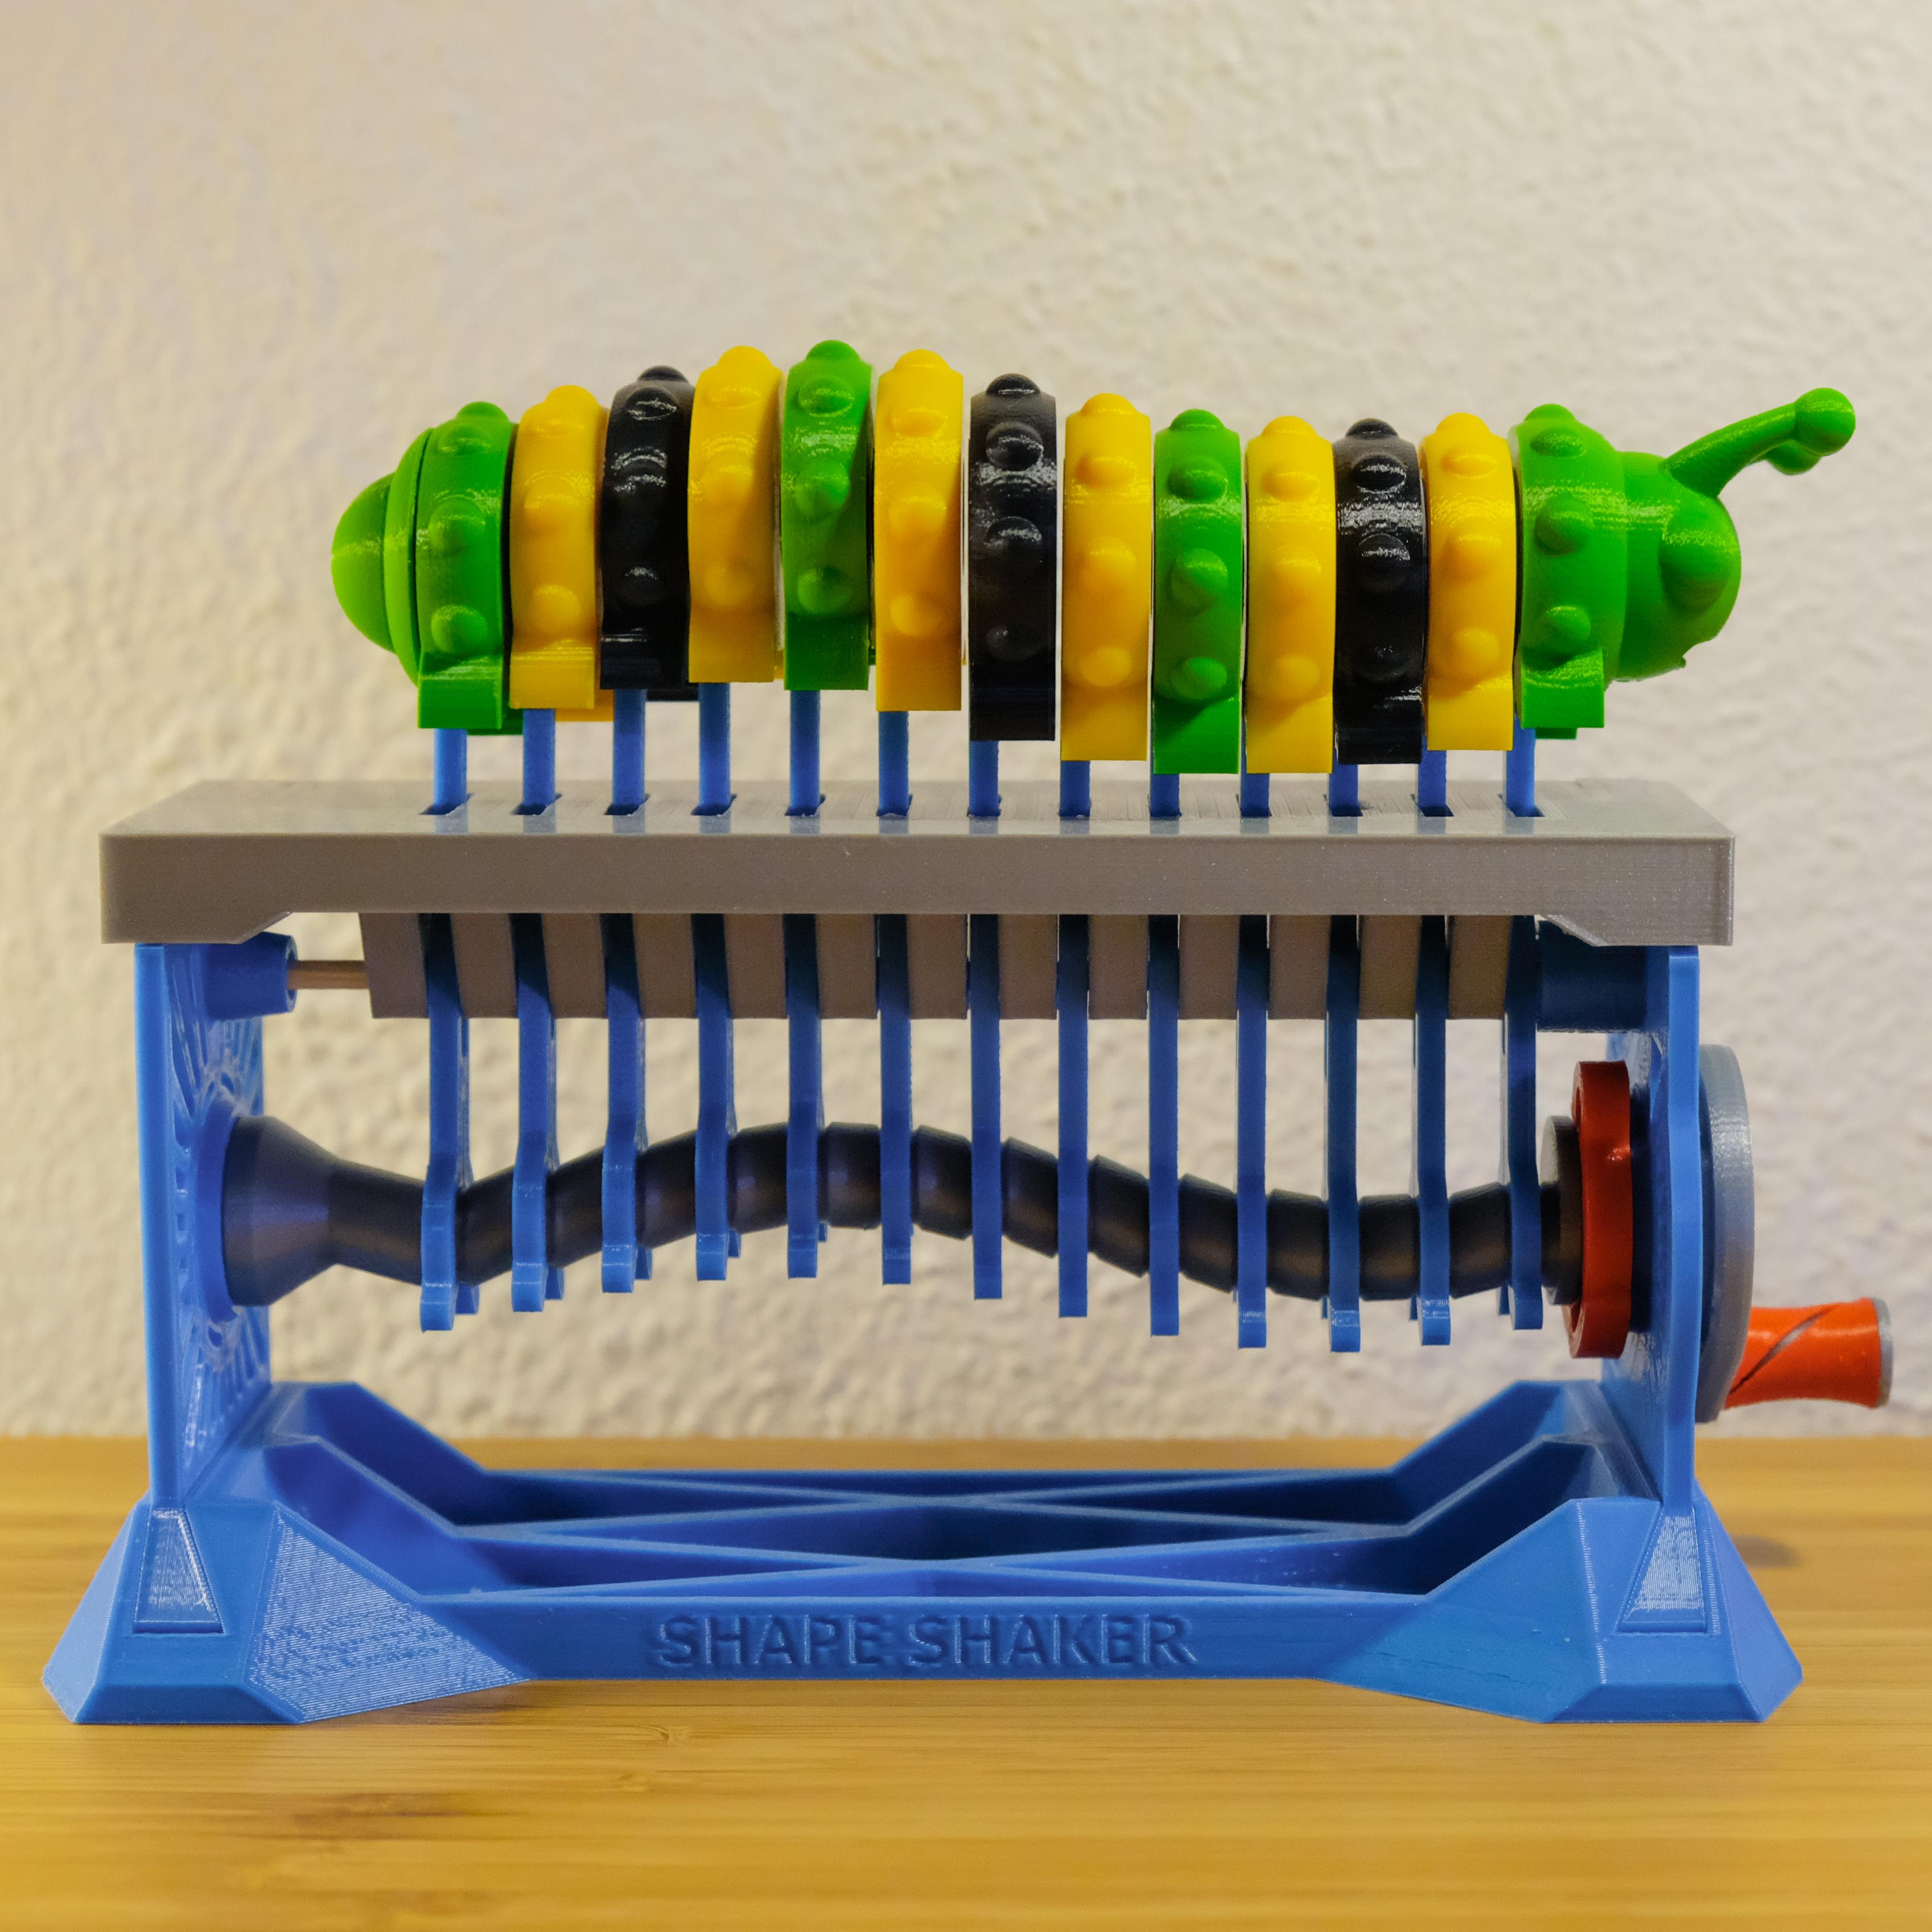 2-11.jpg Download STL file Shape Shaker_Caterpillar • Design to 3D print, Ocrobus